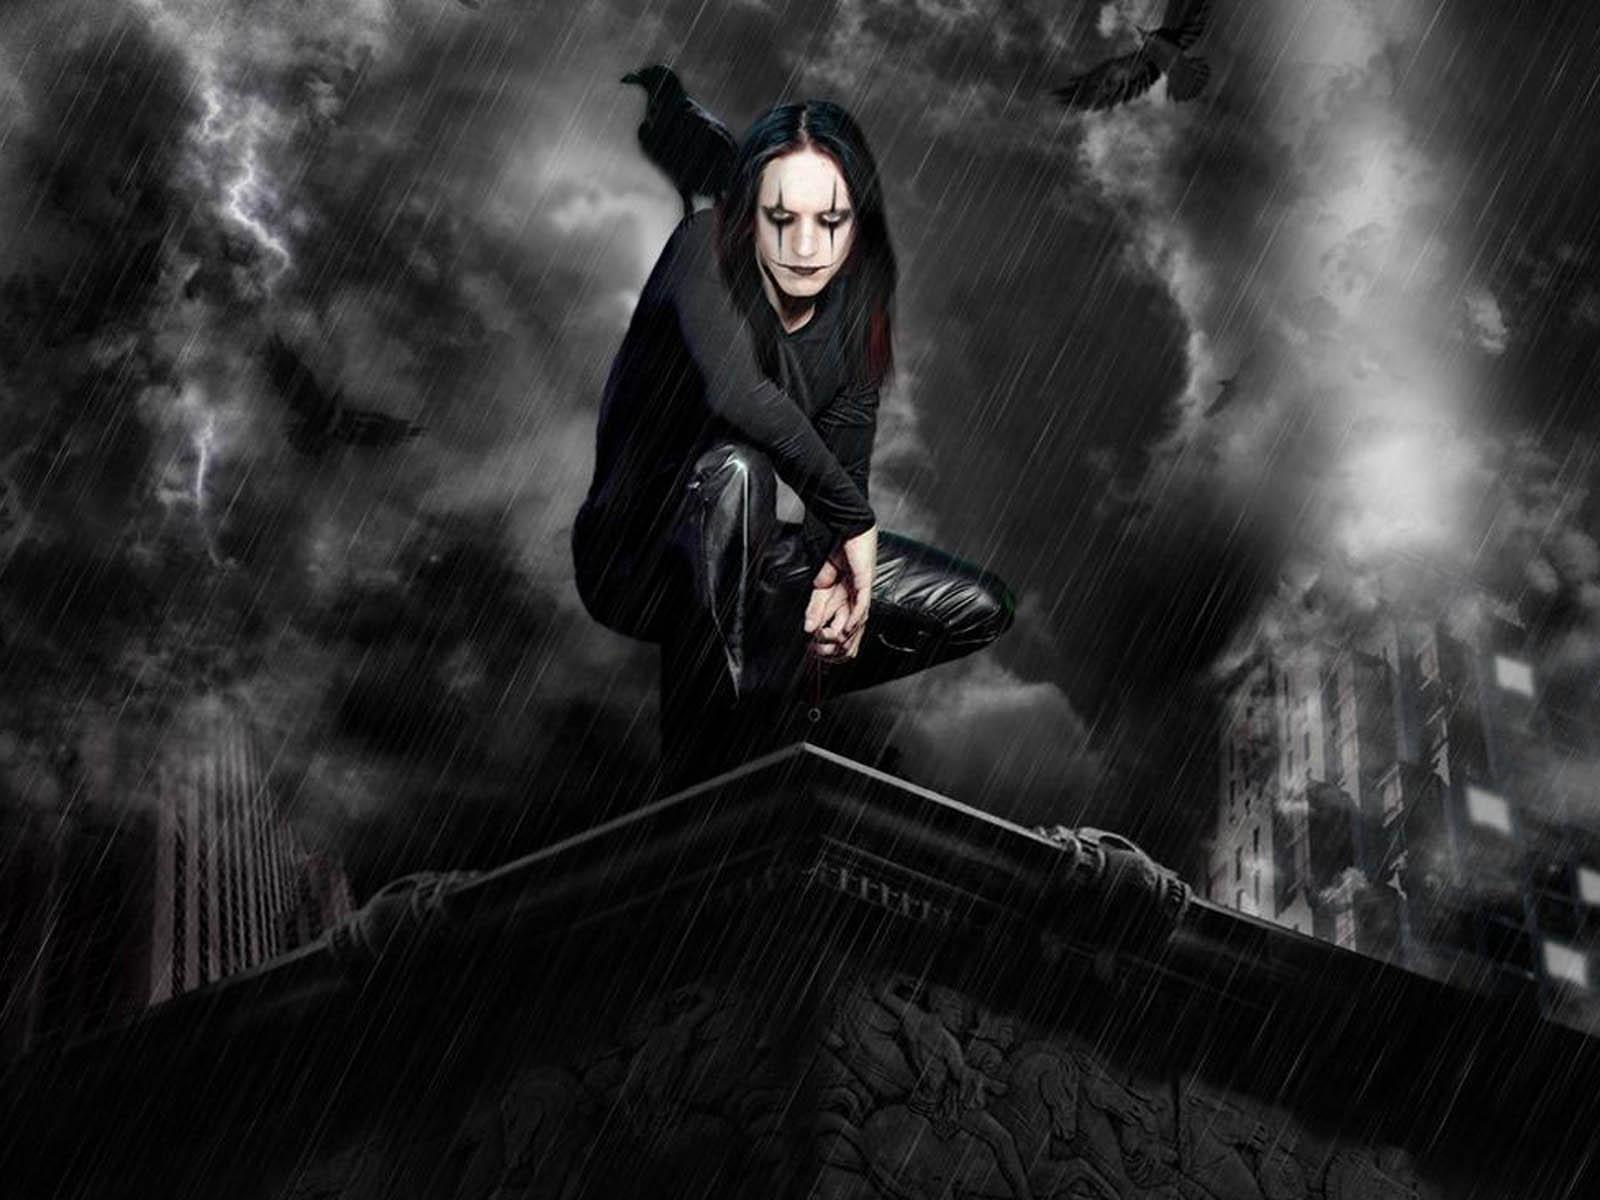 wallpaper Dark Gothic Wallpapers 1600x1200